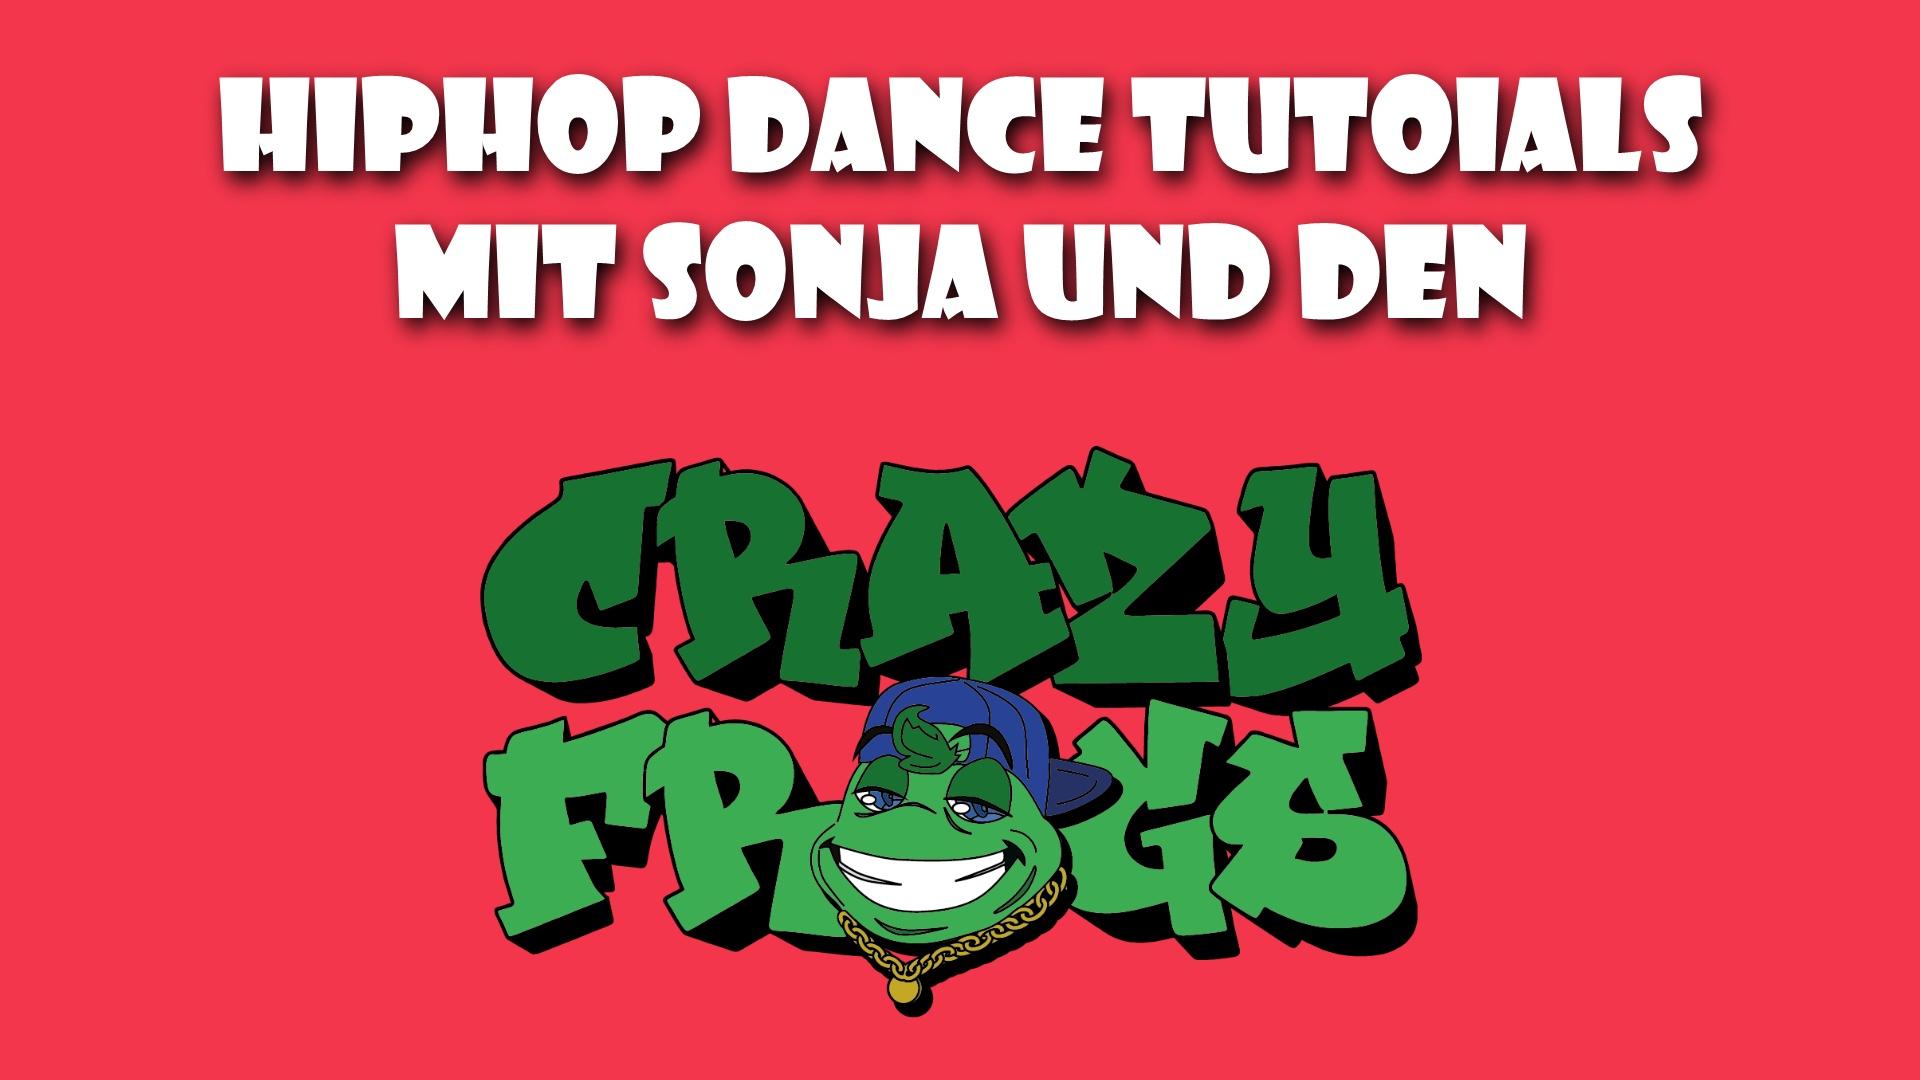 jugendkulturjahr-2020-ratingen-SonjaReischl-CrazyFrogs-HipHopDanceTutorials